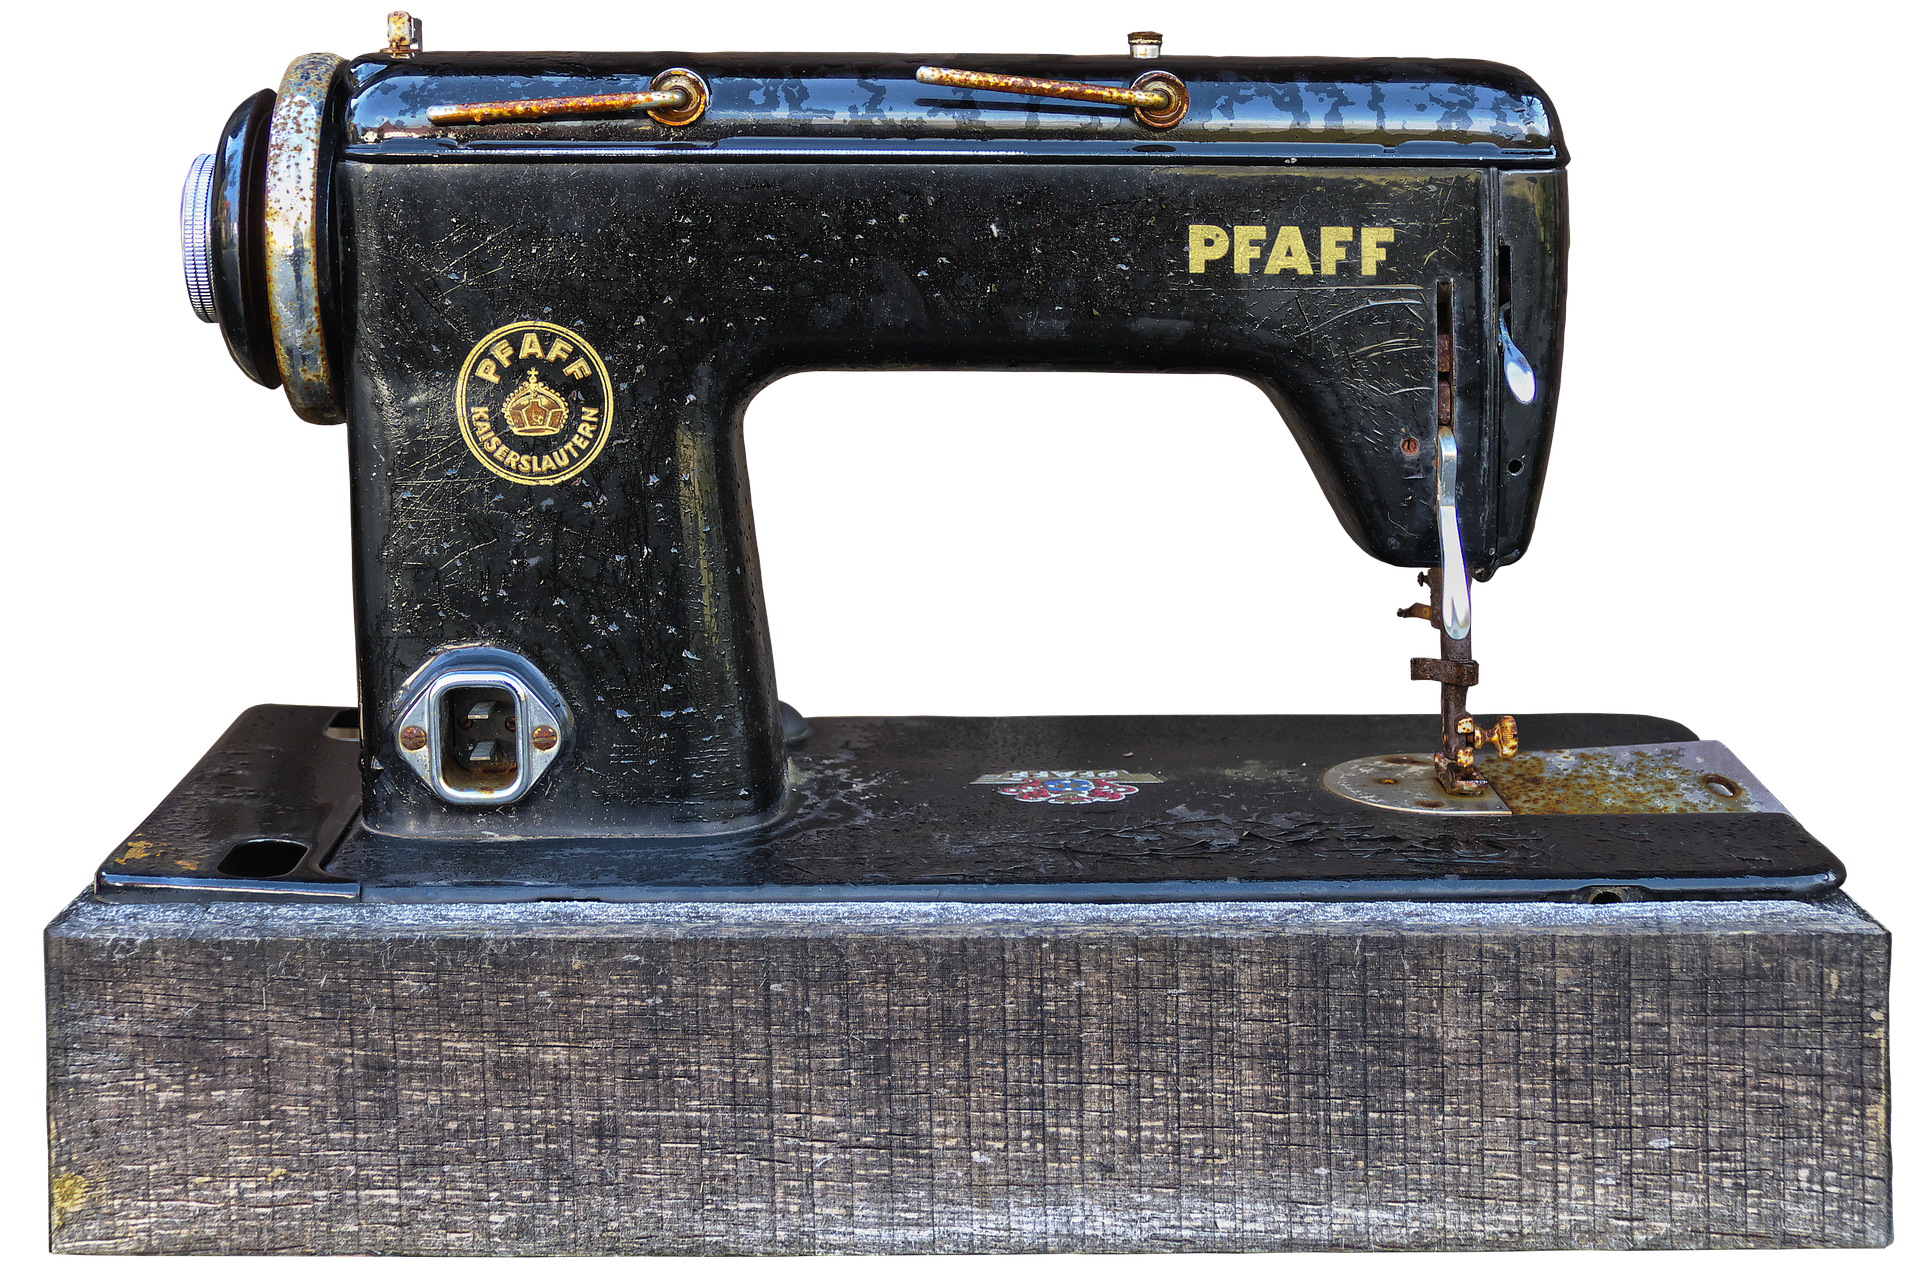 sewing-machine-3232318_1920